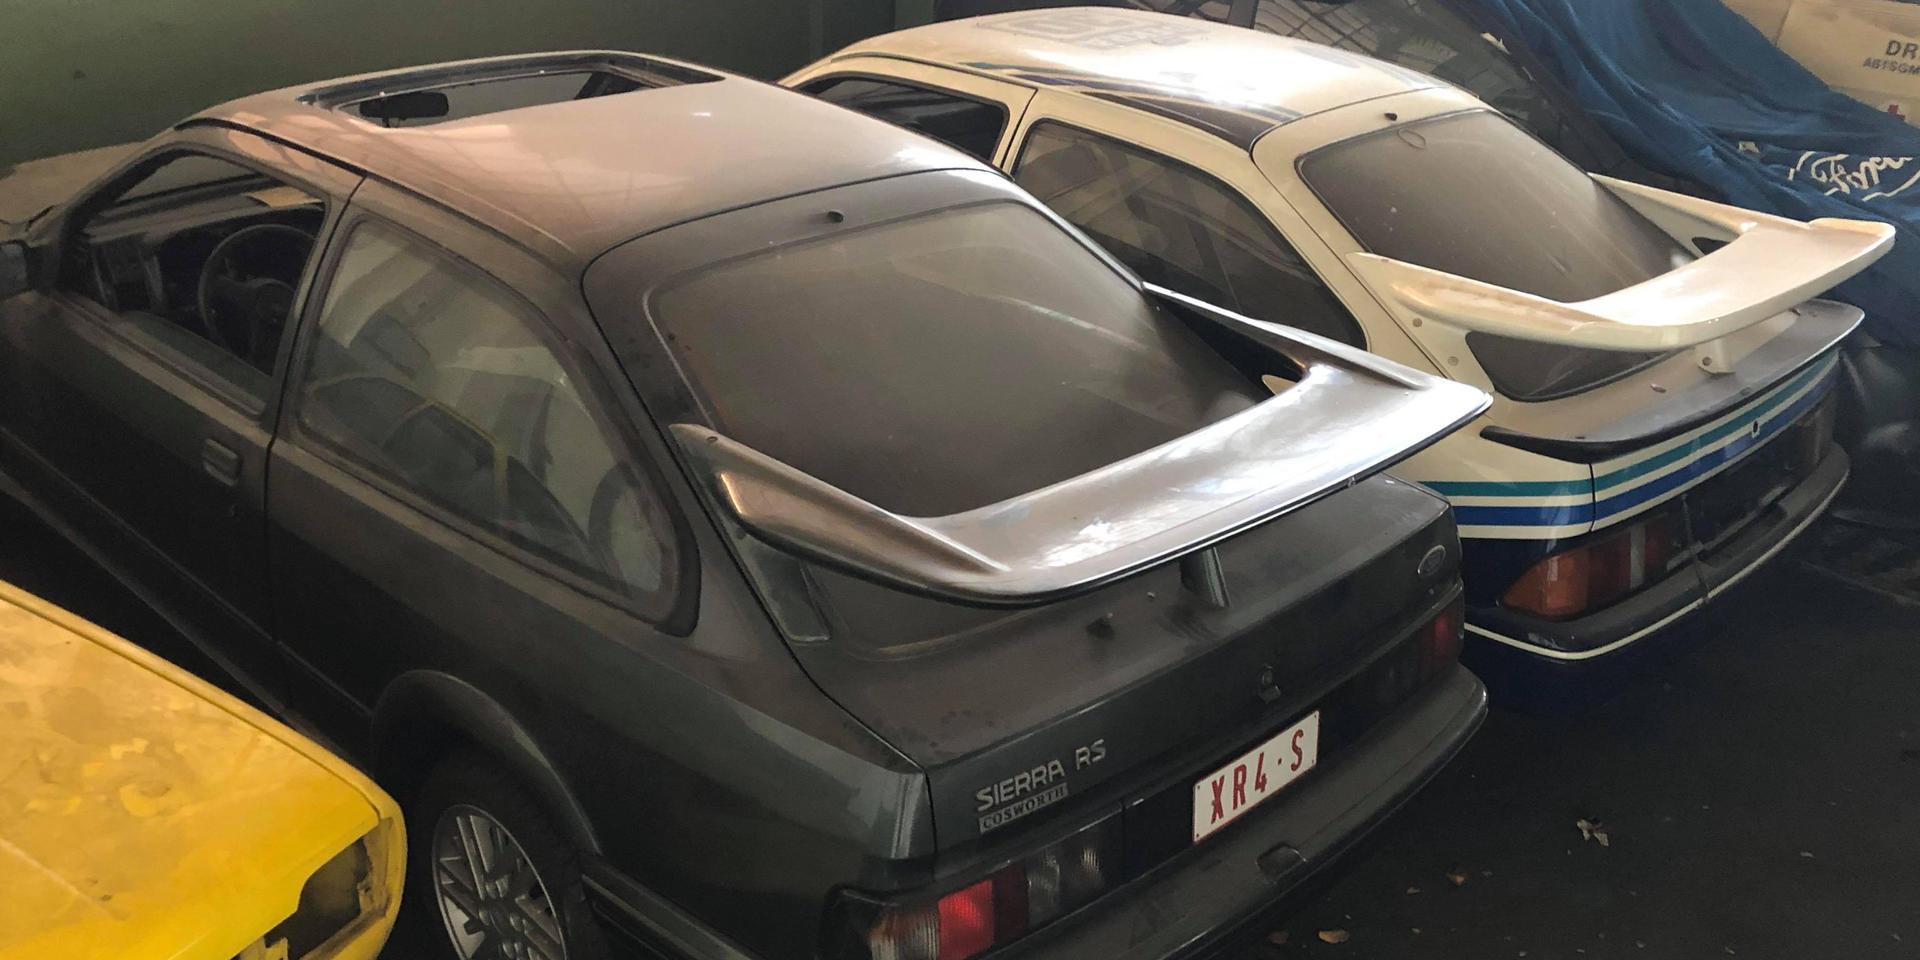 The rarest Cosworth